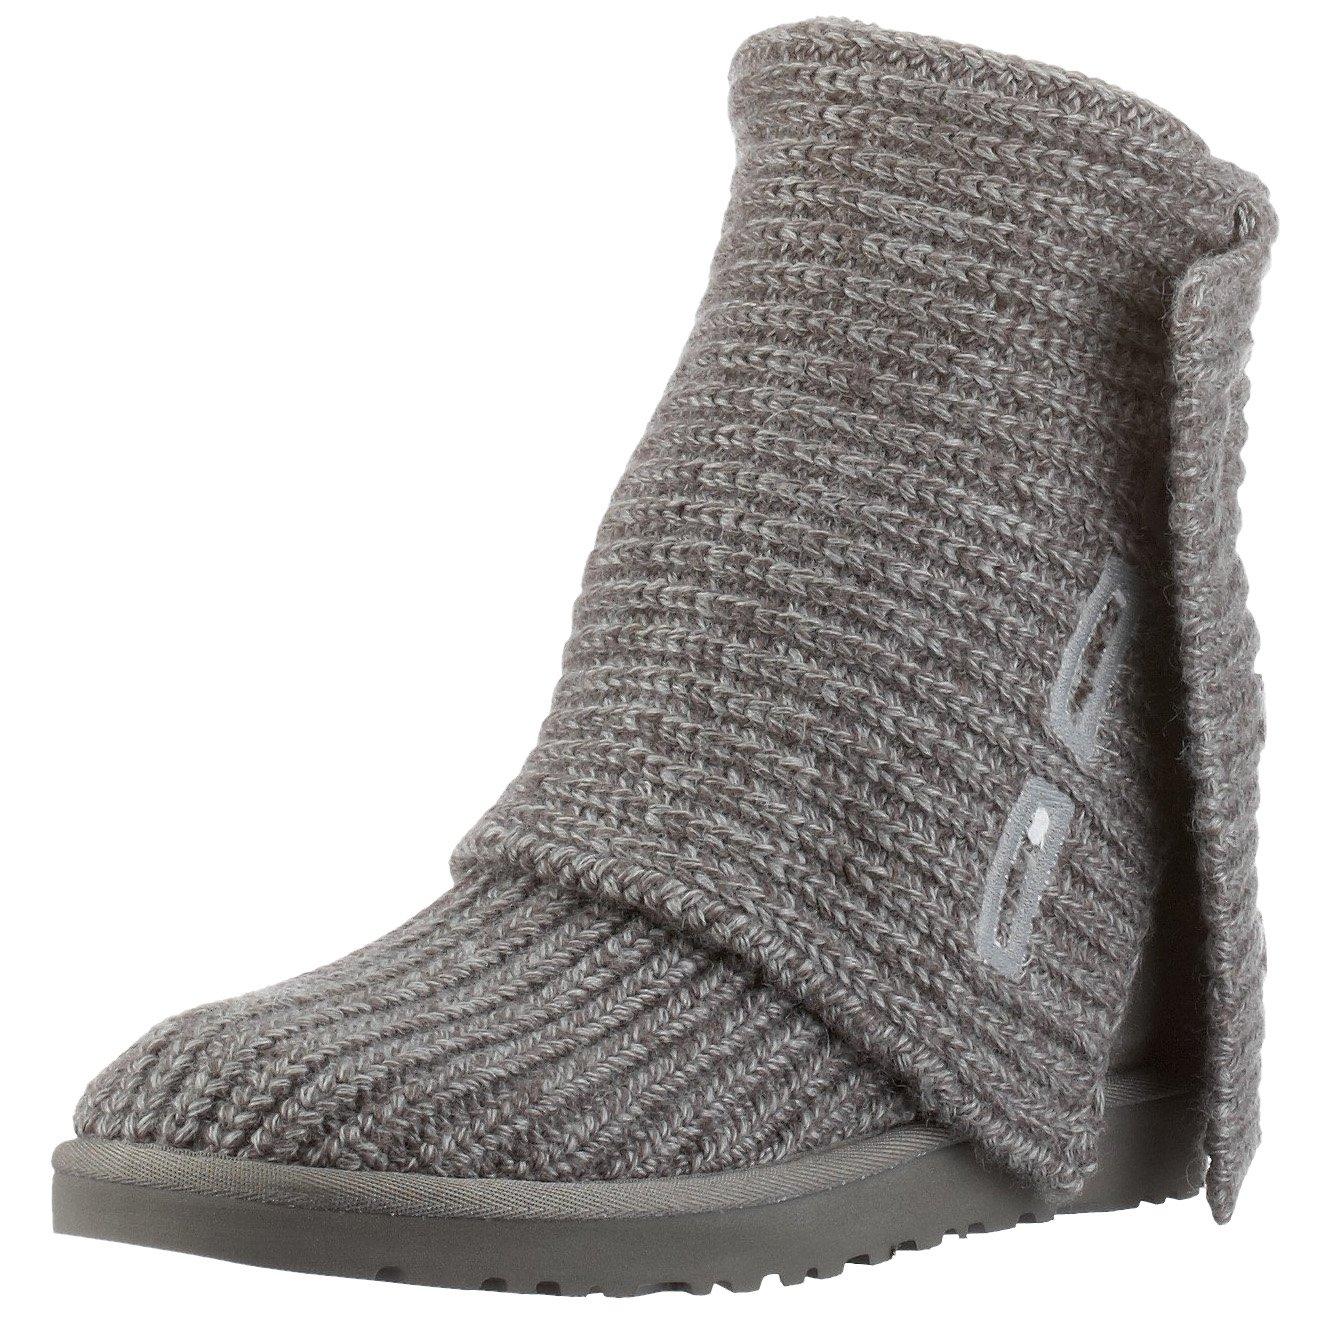 UGG Australia Women's Classic Cardy Knit Sheepskin Fashion Boot Grey 10 M US by UGG